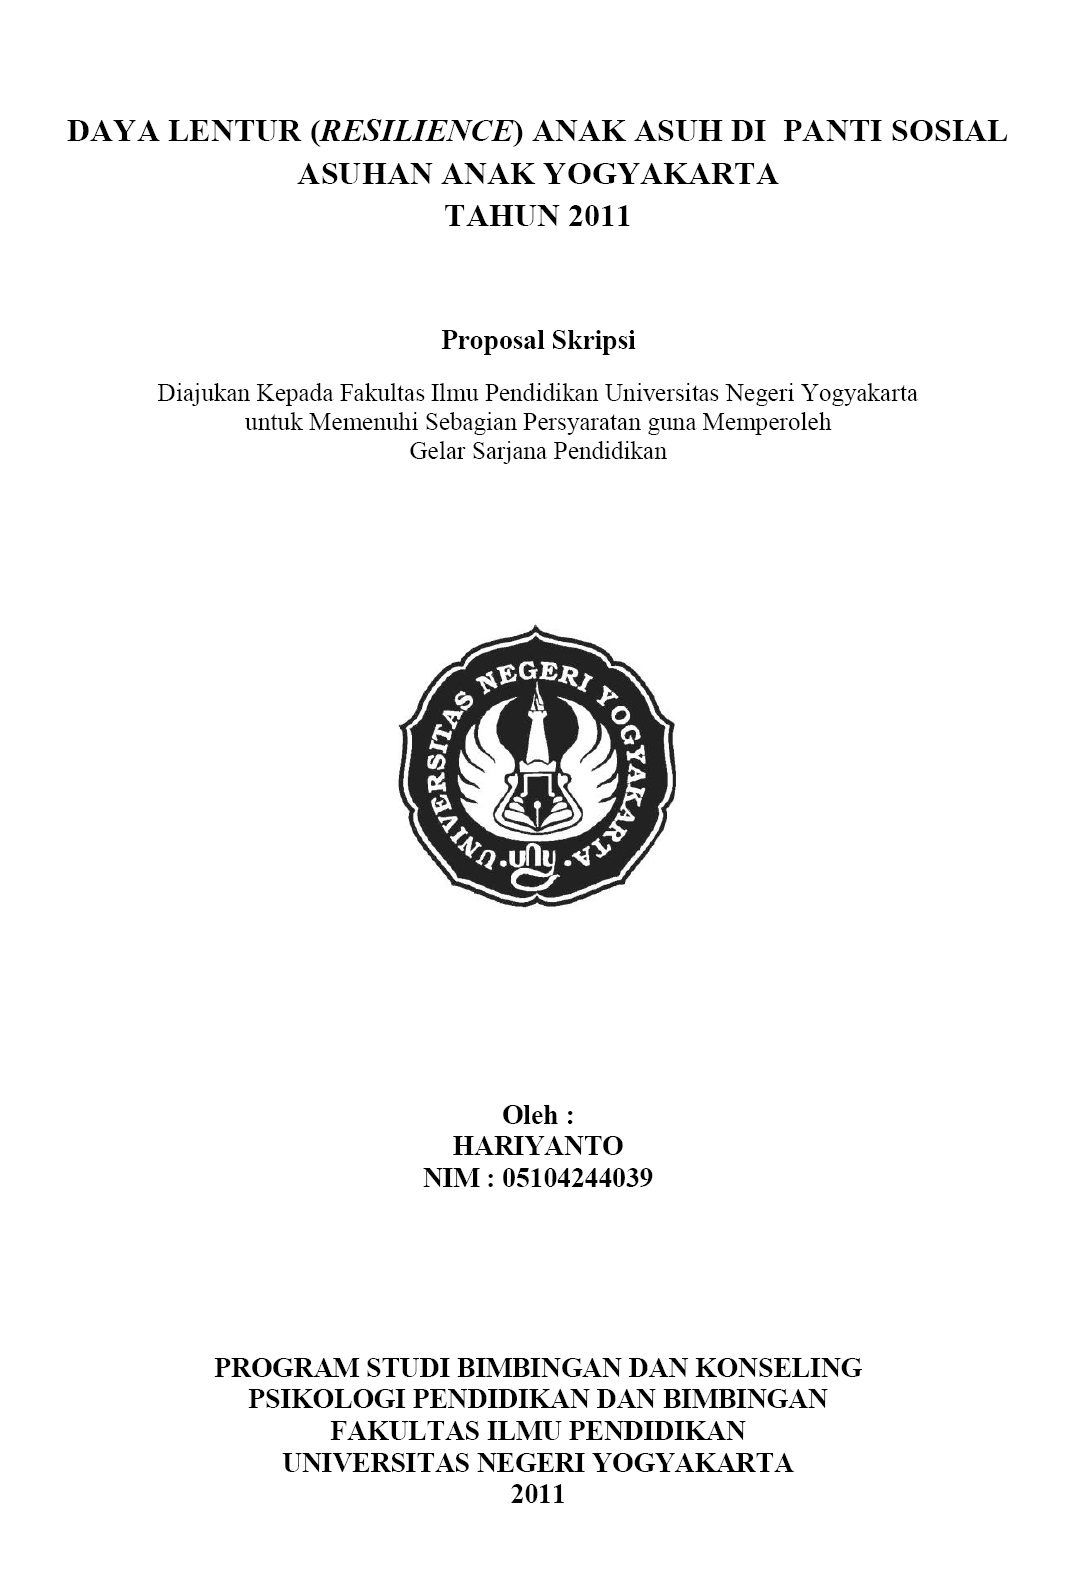 Contoh Proposal Skripsi Tesis Tugas akhir